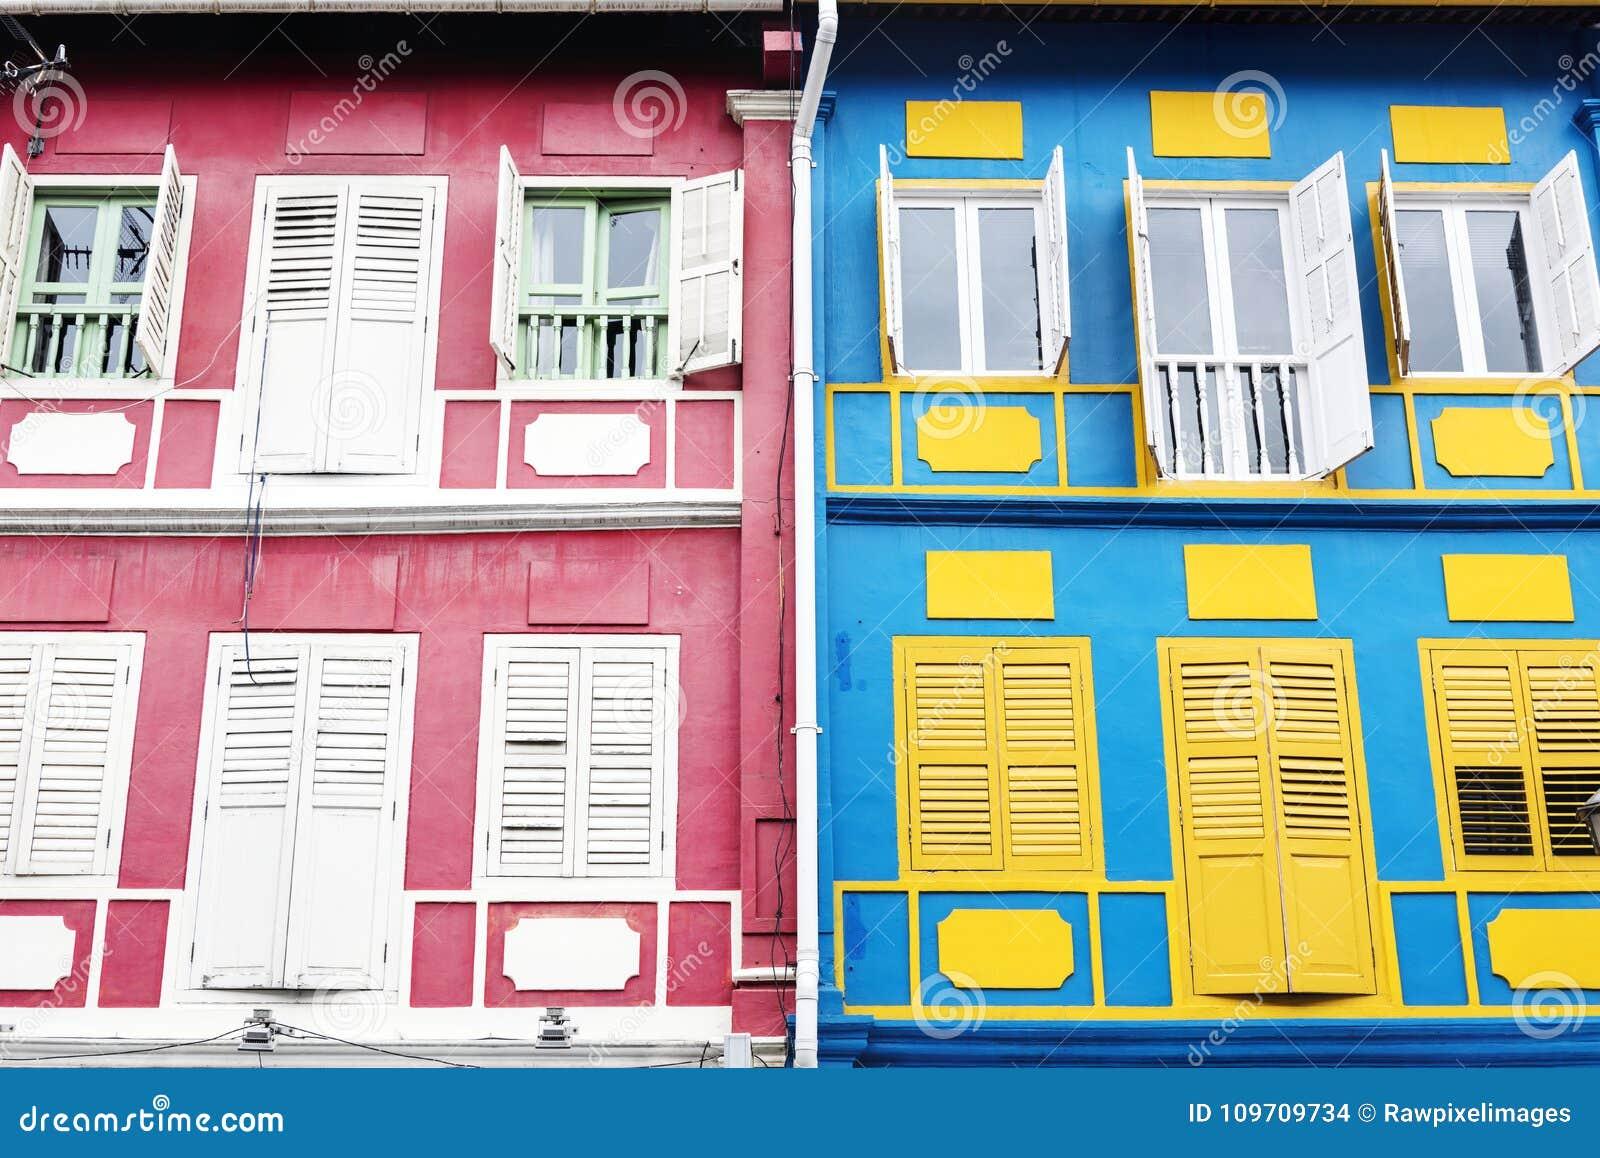 Colourful apartment buildings artistic structure